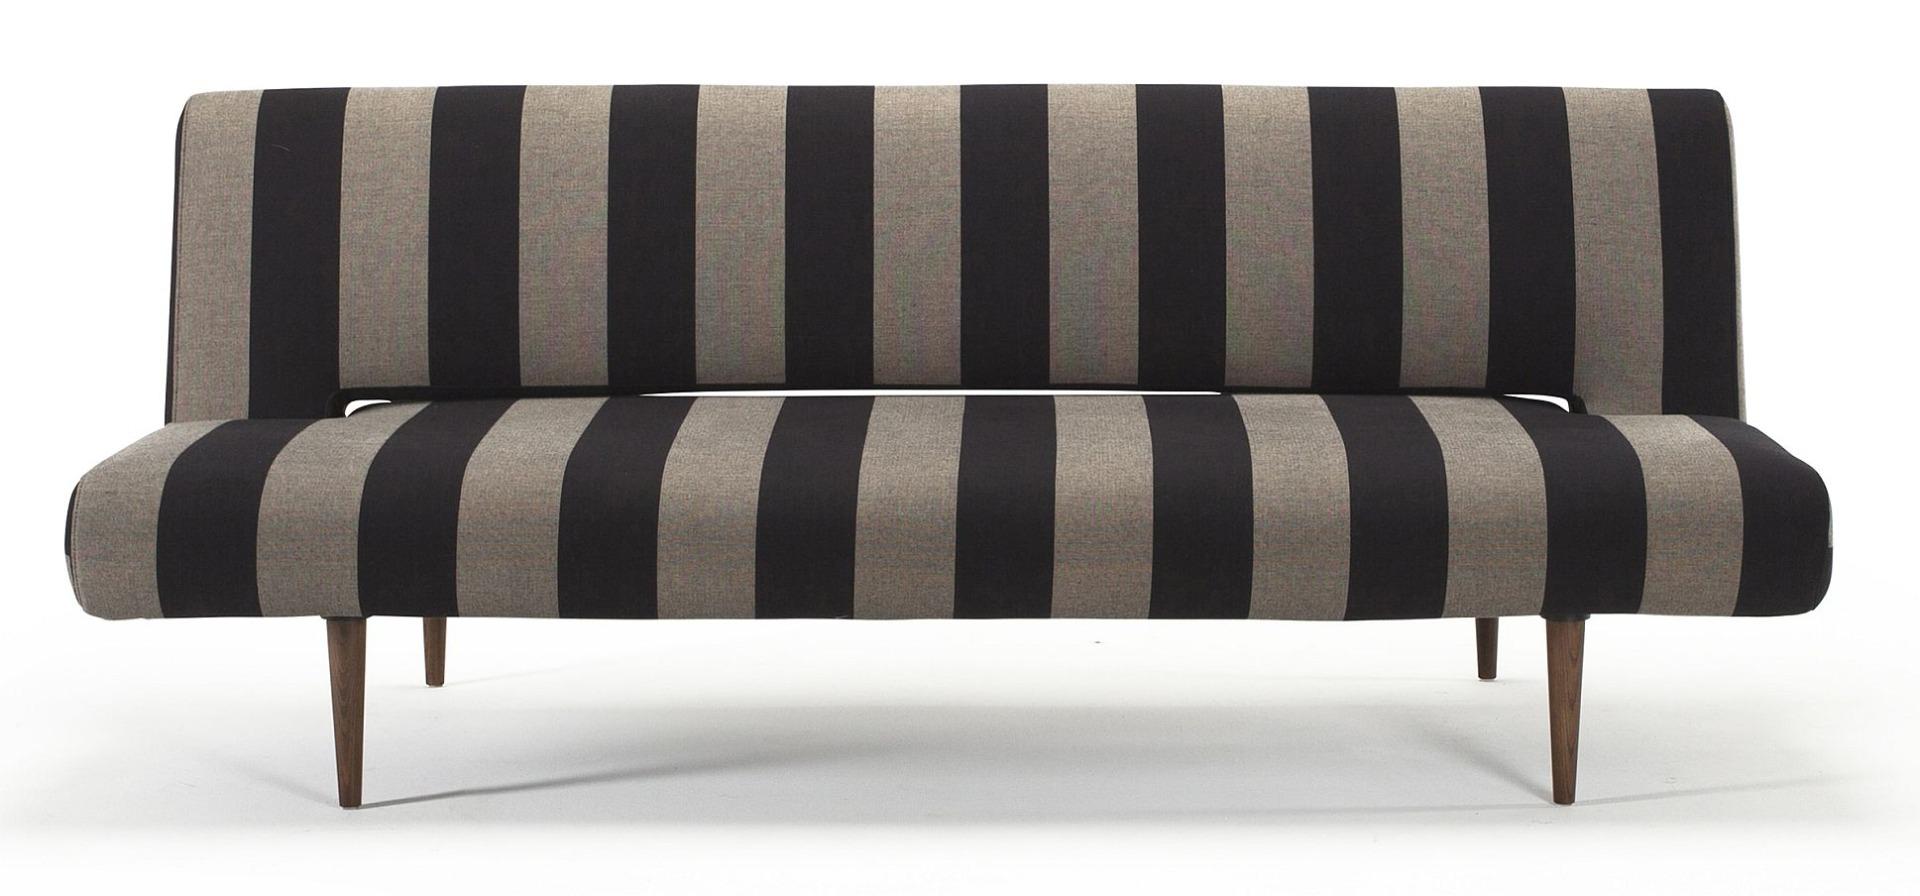 Innovation Slaapbank Unfurl - Limited Edition - Stripe Zwart/Zand